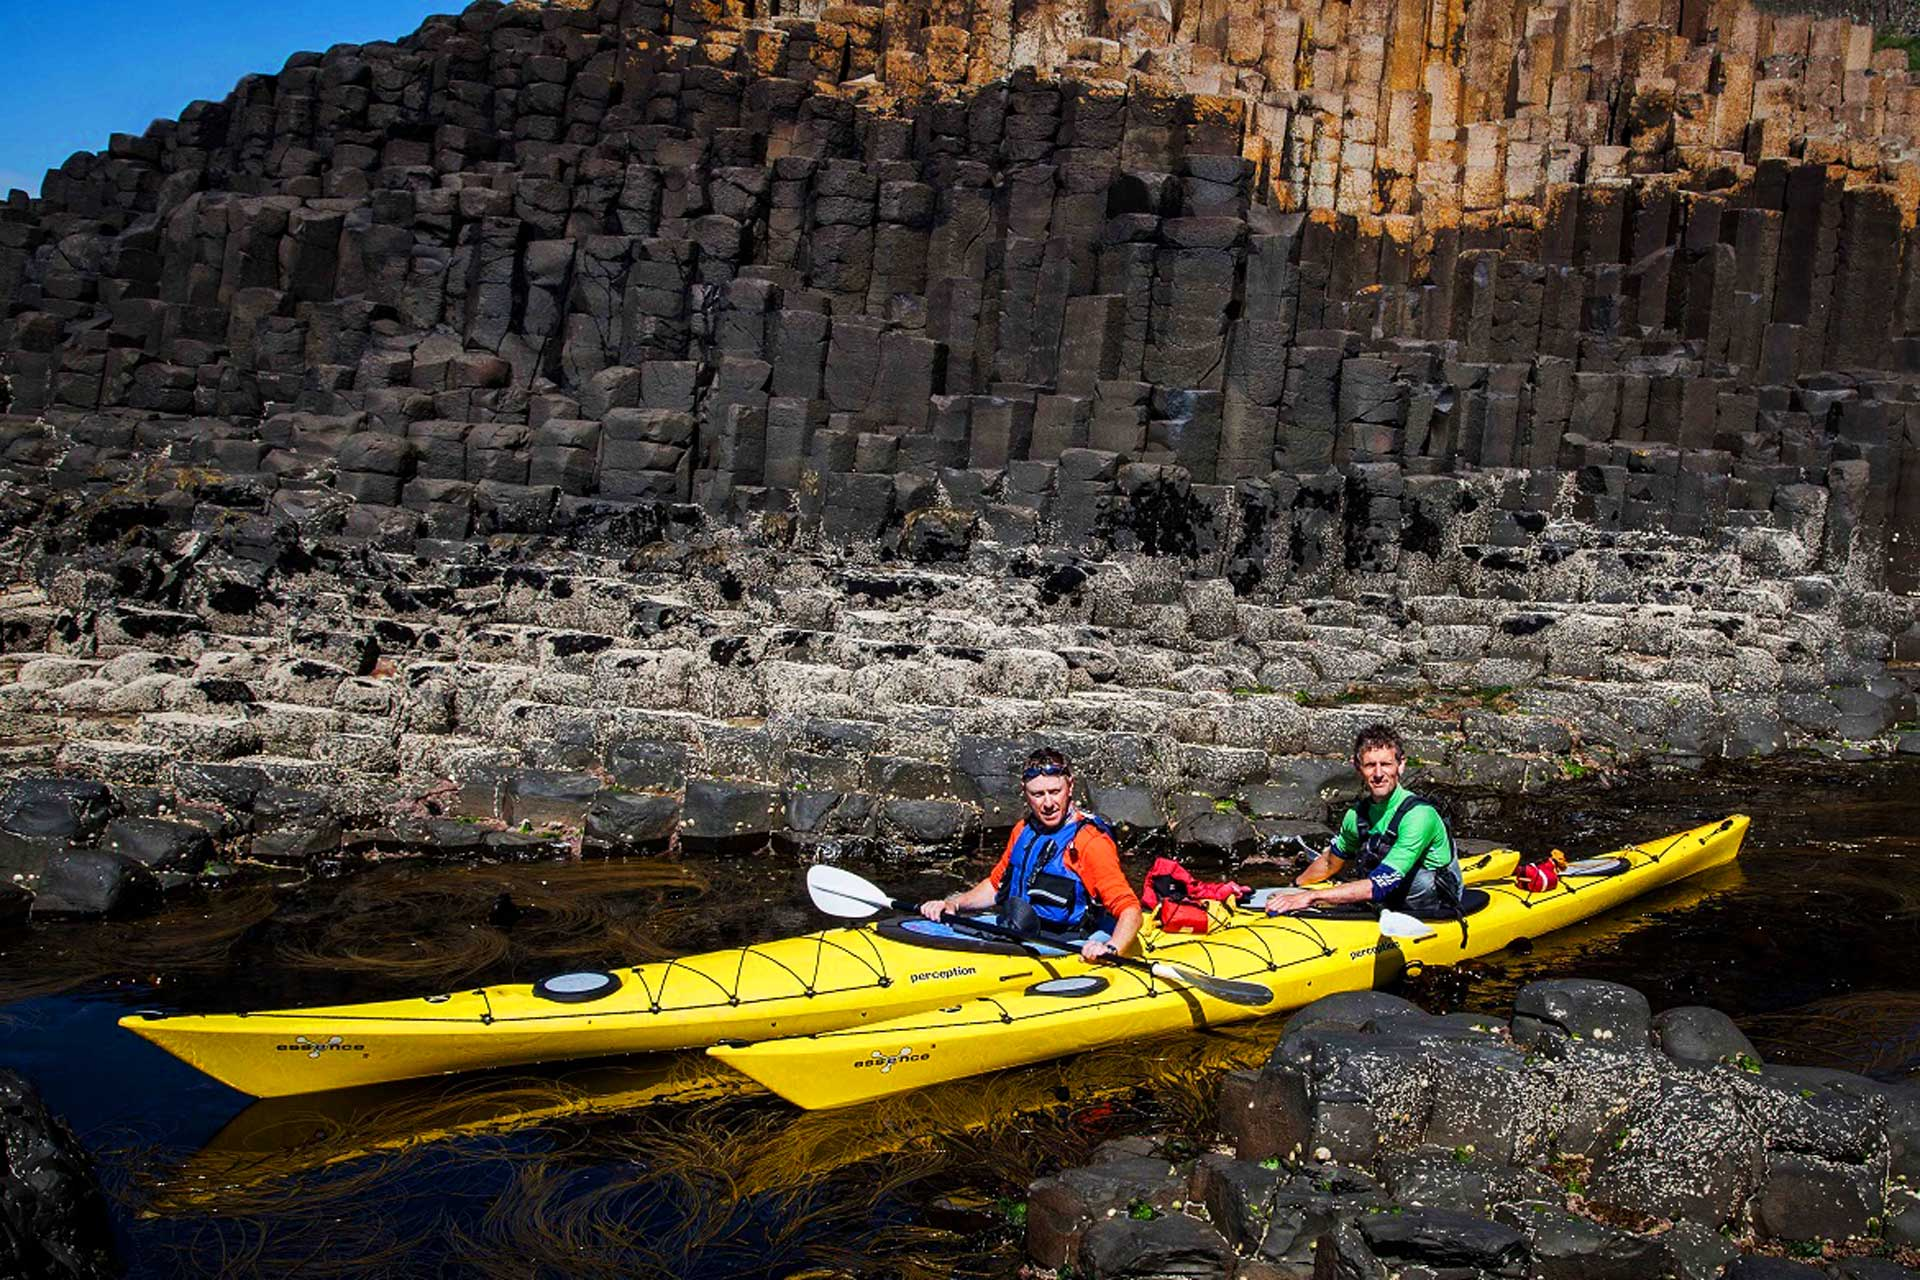 giants causeway sea kayaking experience